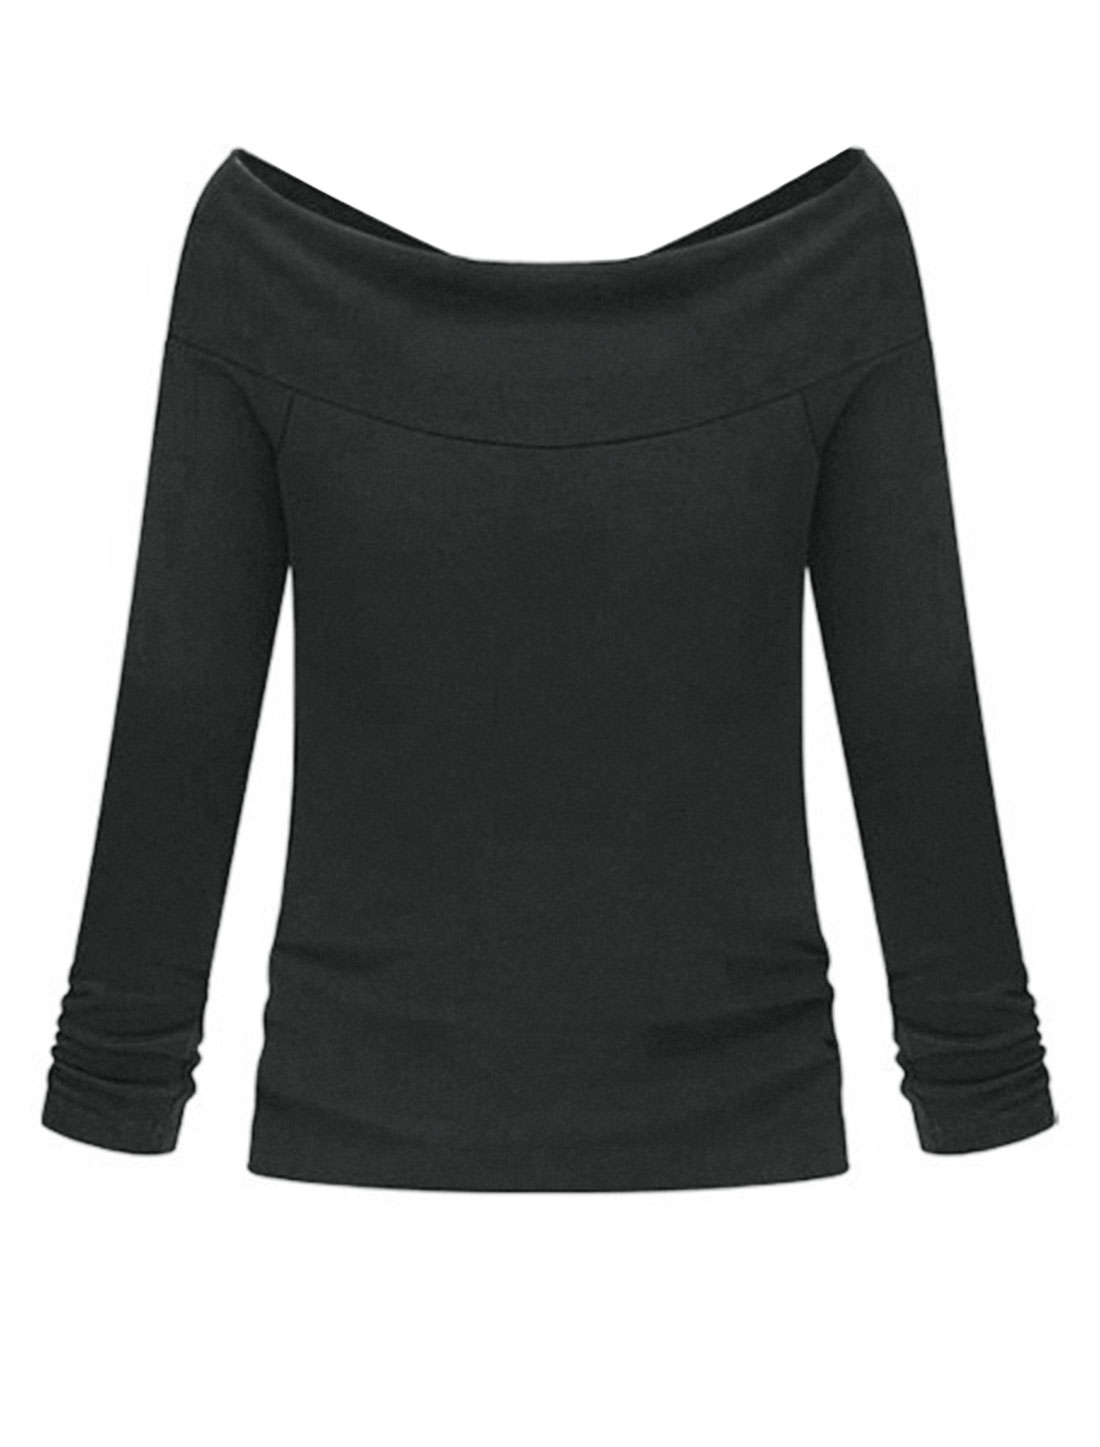 Lady Fashion Style Off Shoulder Stretch Tee Shirt Dark Gray XS